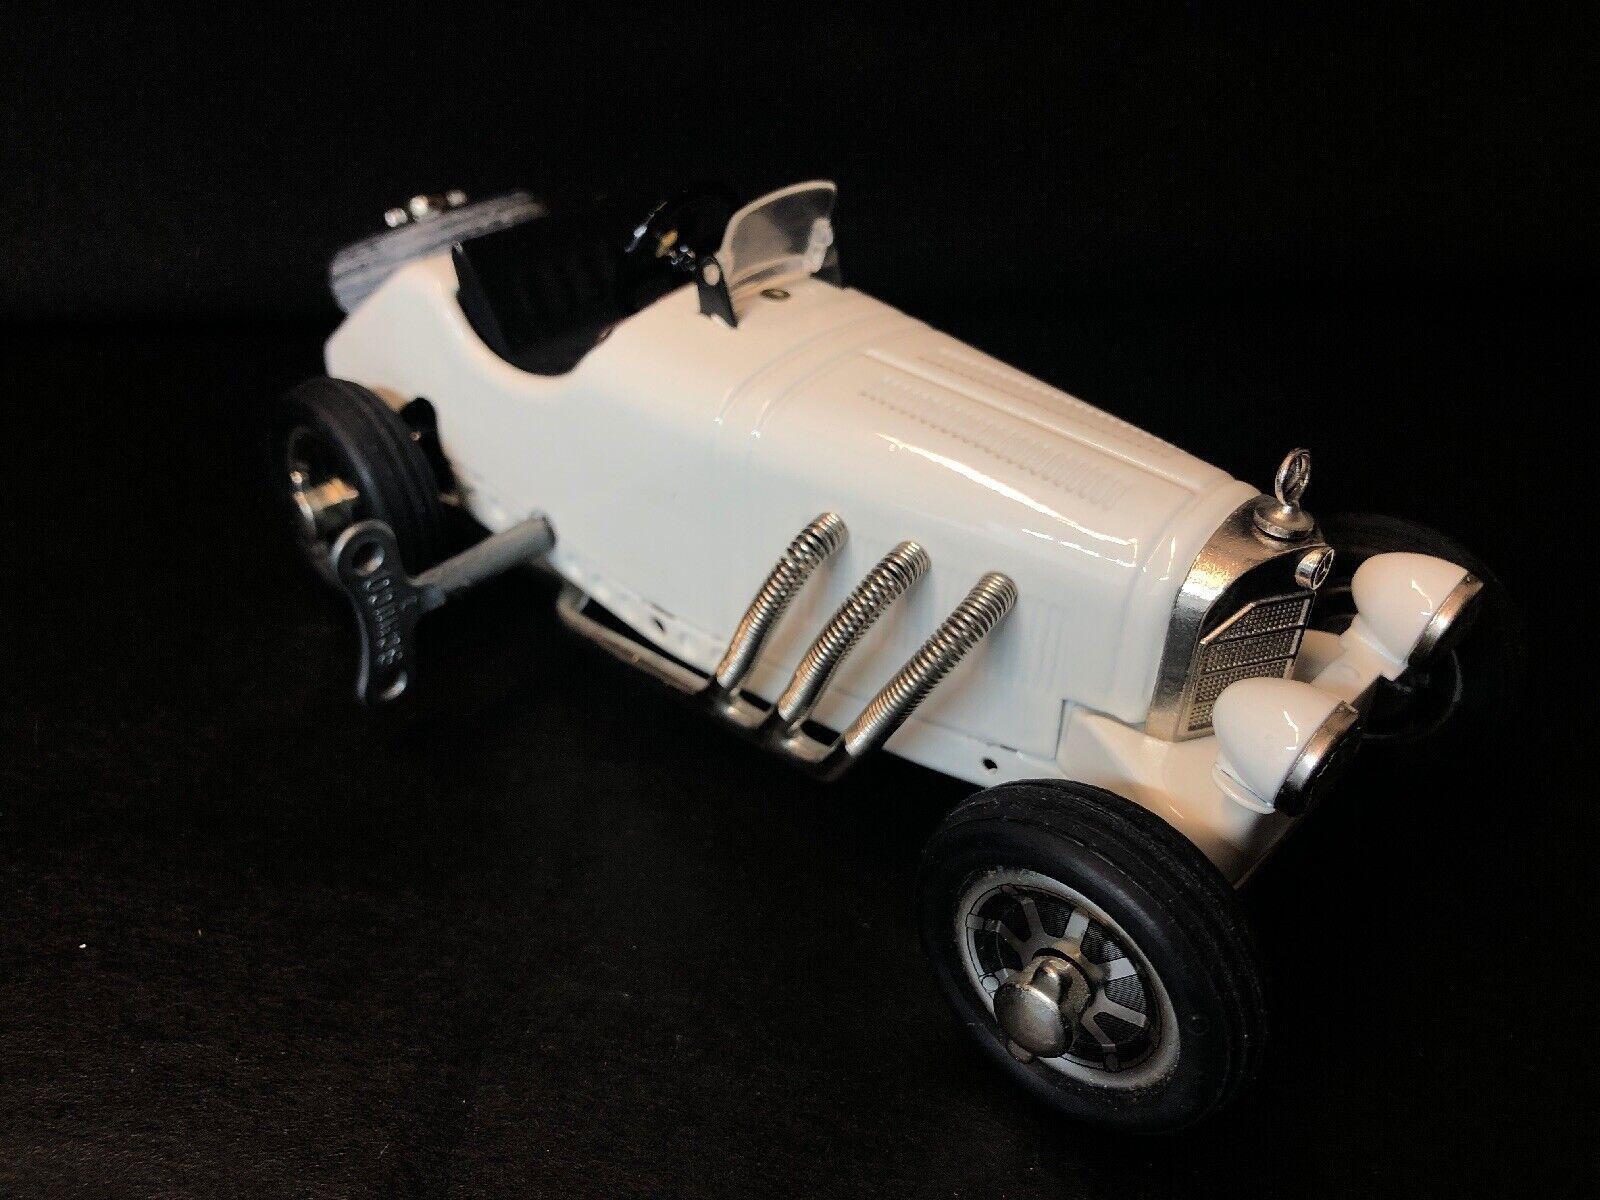 Schuco Ssk L  Studio v Mercedes-Benz made in Gerhommey blanc Wind Up with Key  commander maintenant les prix les plus bas